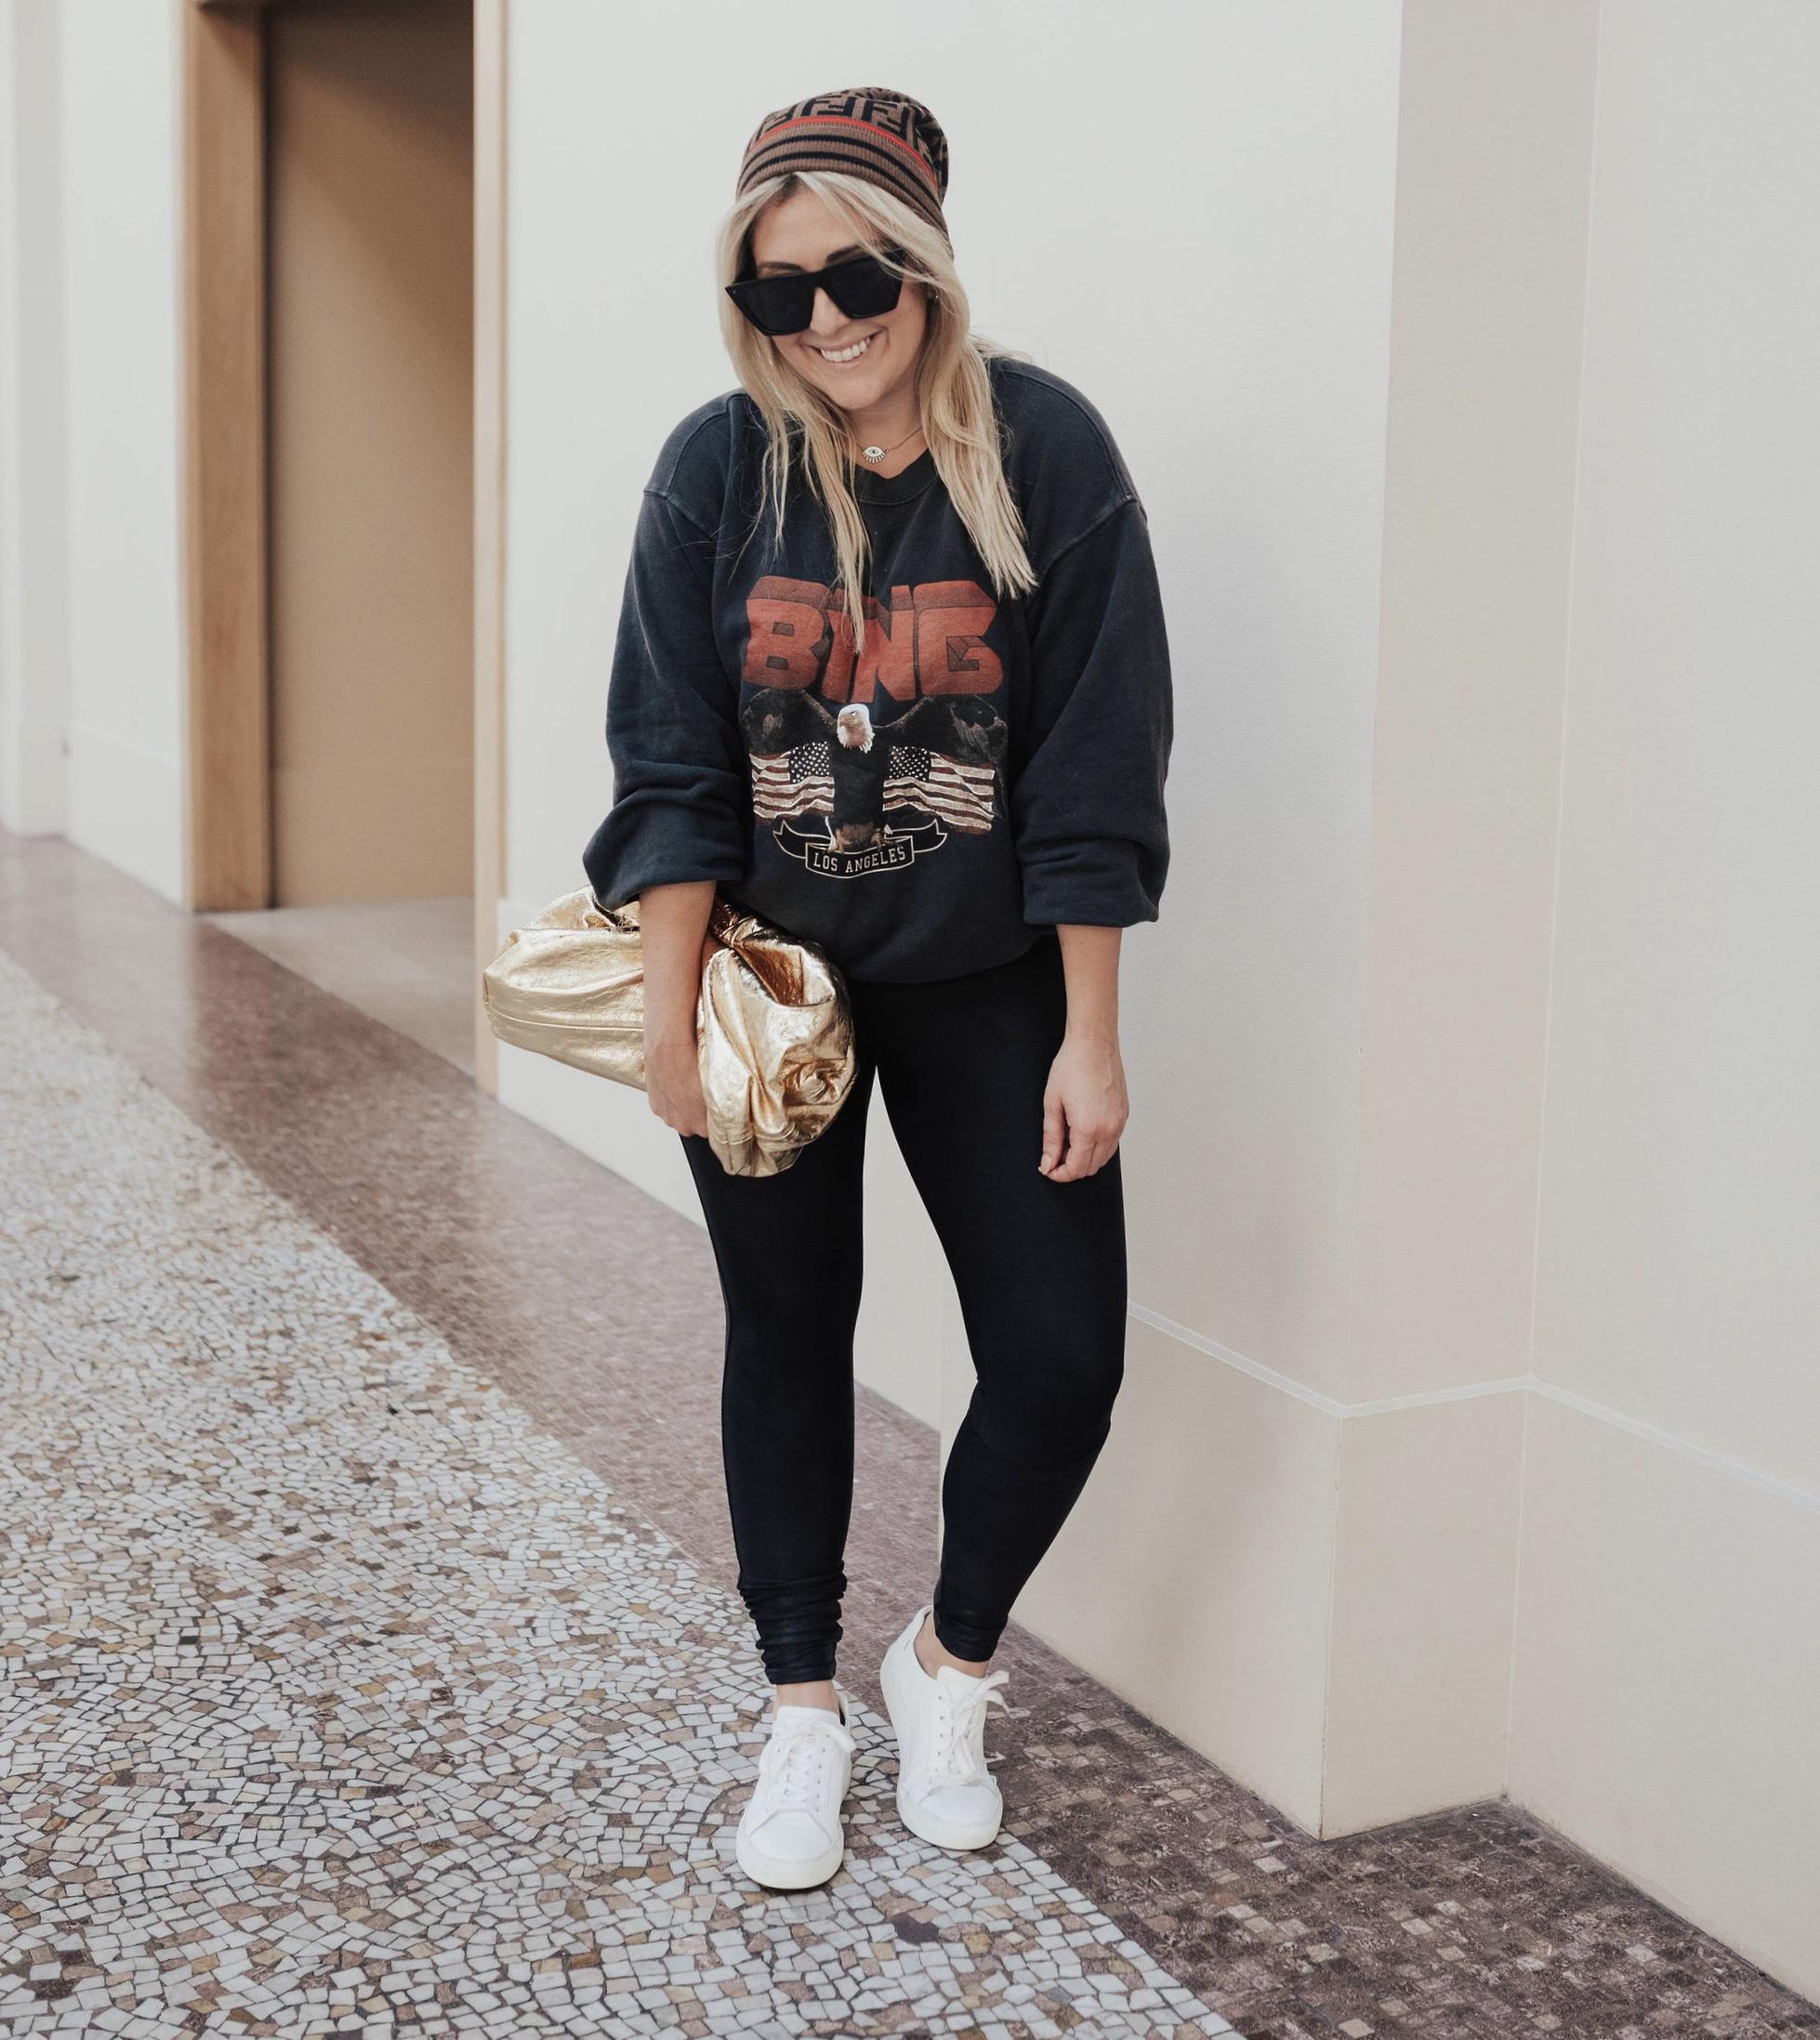 Anine Bing overpriced vintage bing sweatshirt